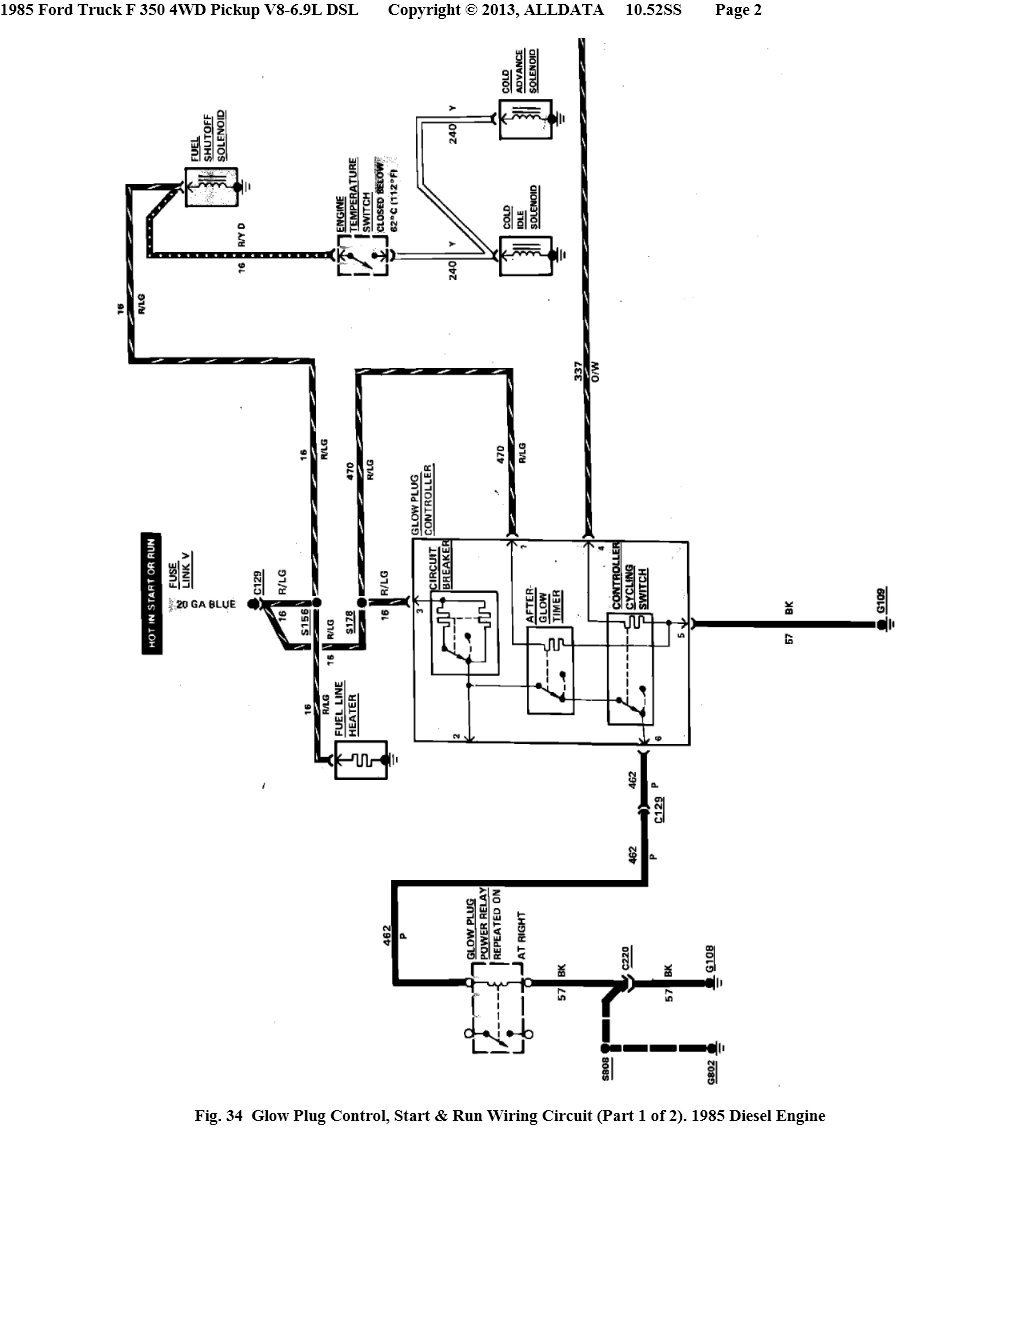 Wiring Diagram Needed